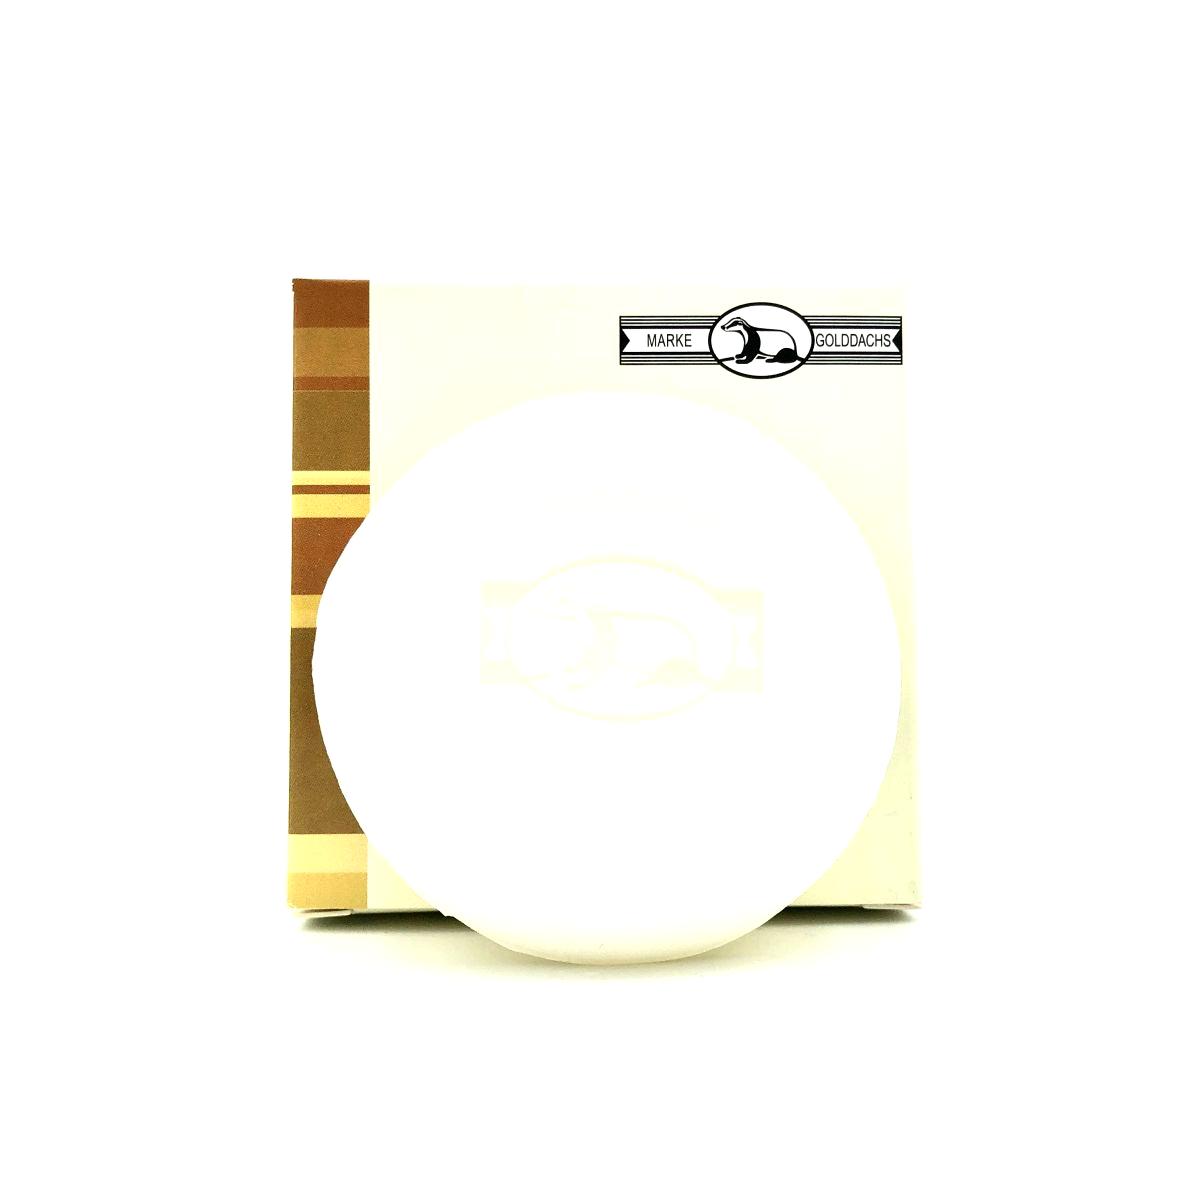 Rasierseife von Golddachs - Classic